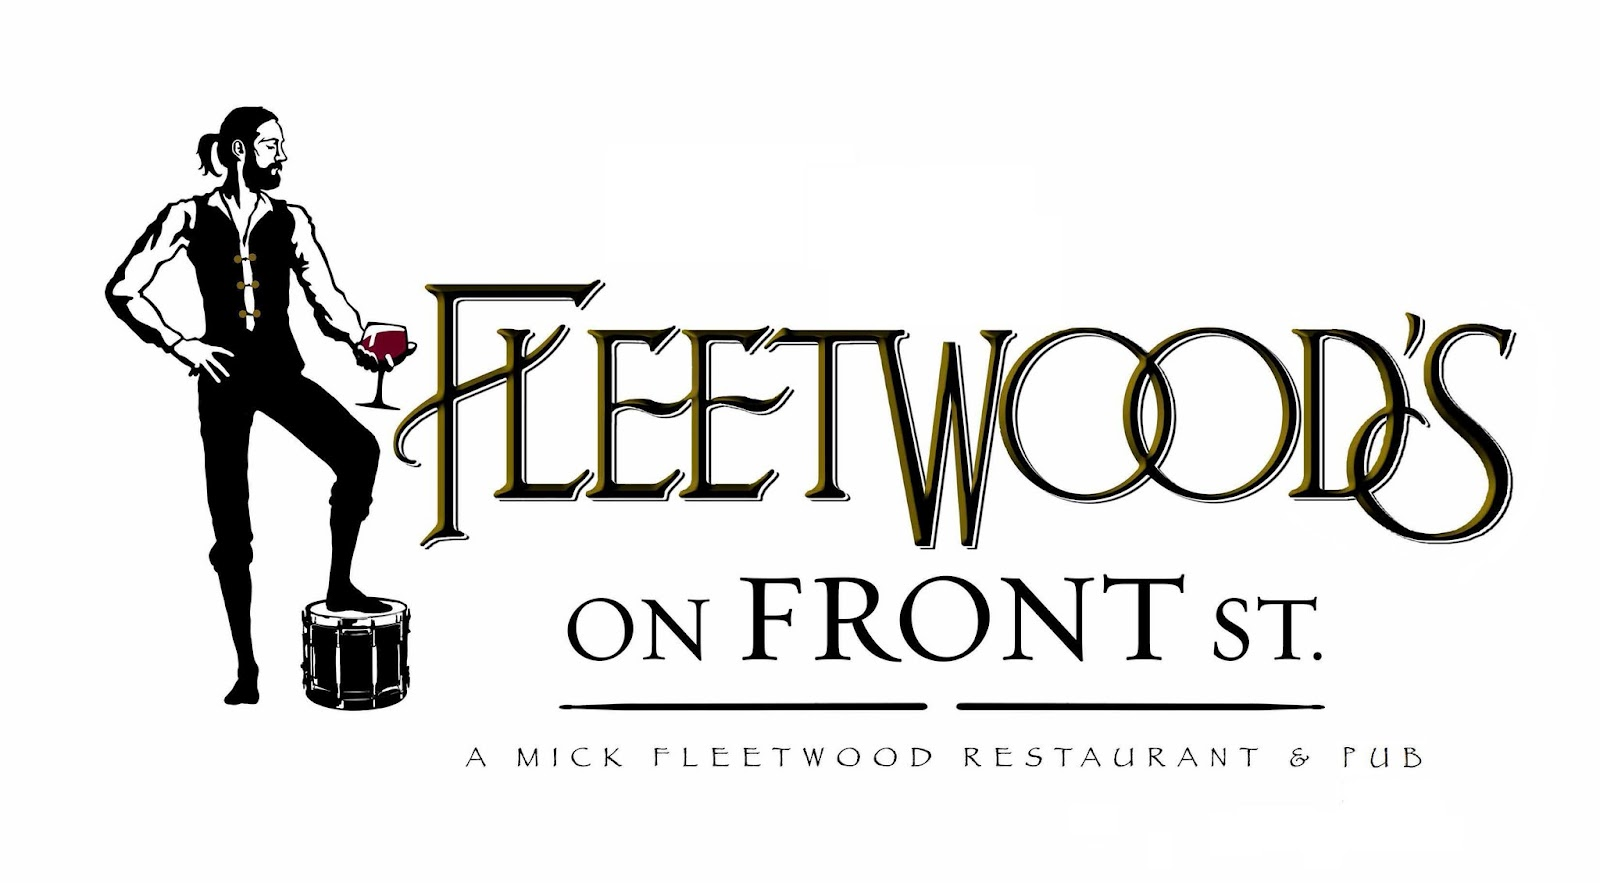 http://2.bp.blogspot.com/-xRGLXWJE2c0/UDDod0fEpbI/AAAAAAAATFA/Gu_A0Cer6Kw/s1600/fleetwoods+on+front+street+maui.jpg